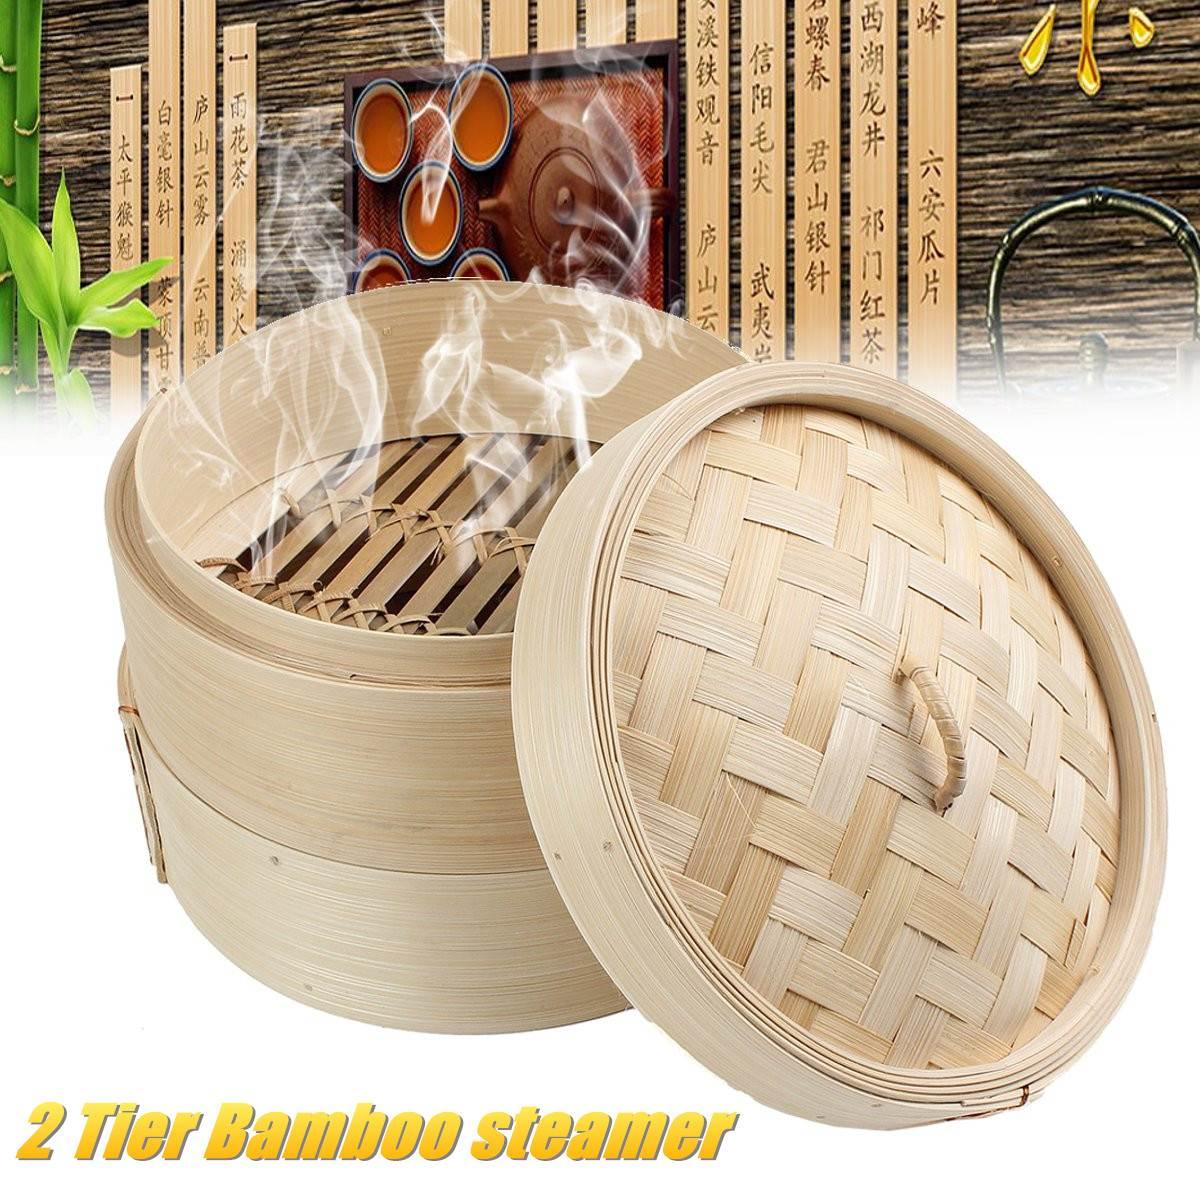 2 Tier 8-Inch Cooking Bamboo Steamer Fish Rice Vegetable Snack Basket Set Kitchen Cooking Tools Dumpling Steamer Steam Pot